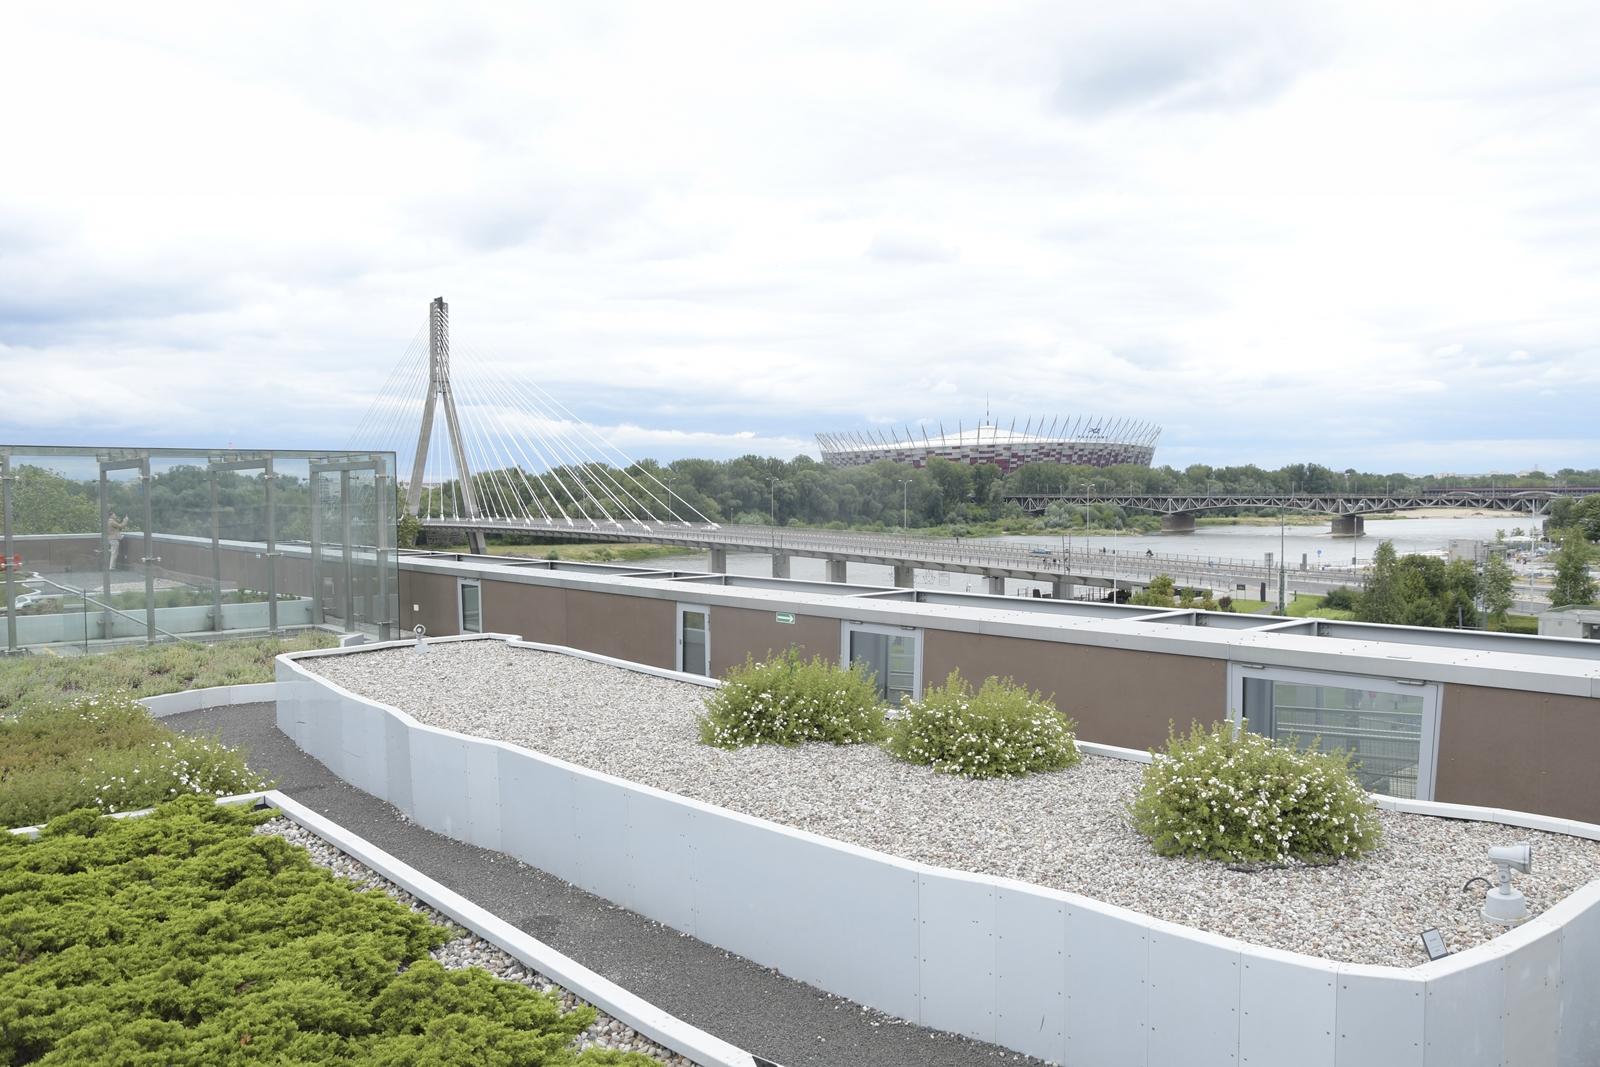 ogród na dachu centrum nauki kopernik